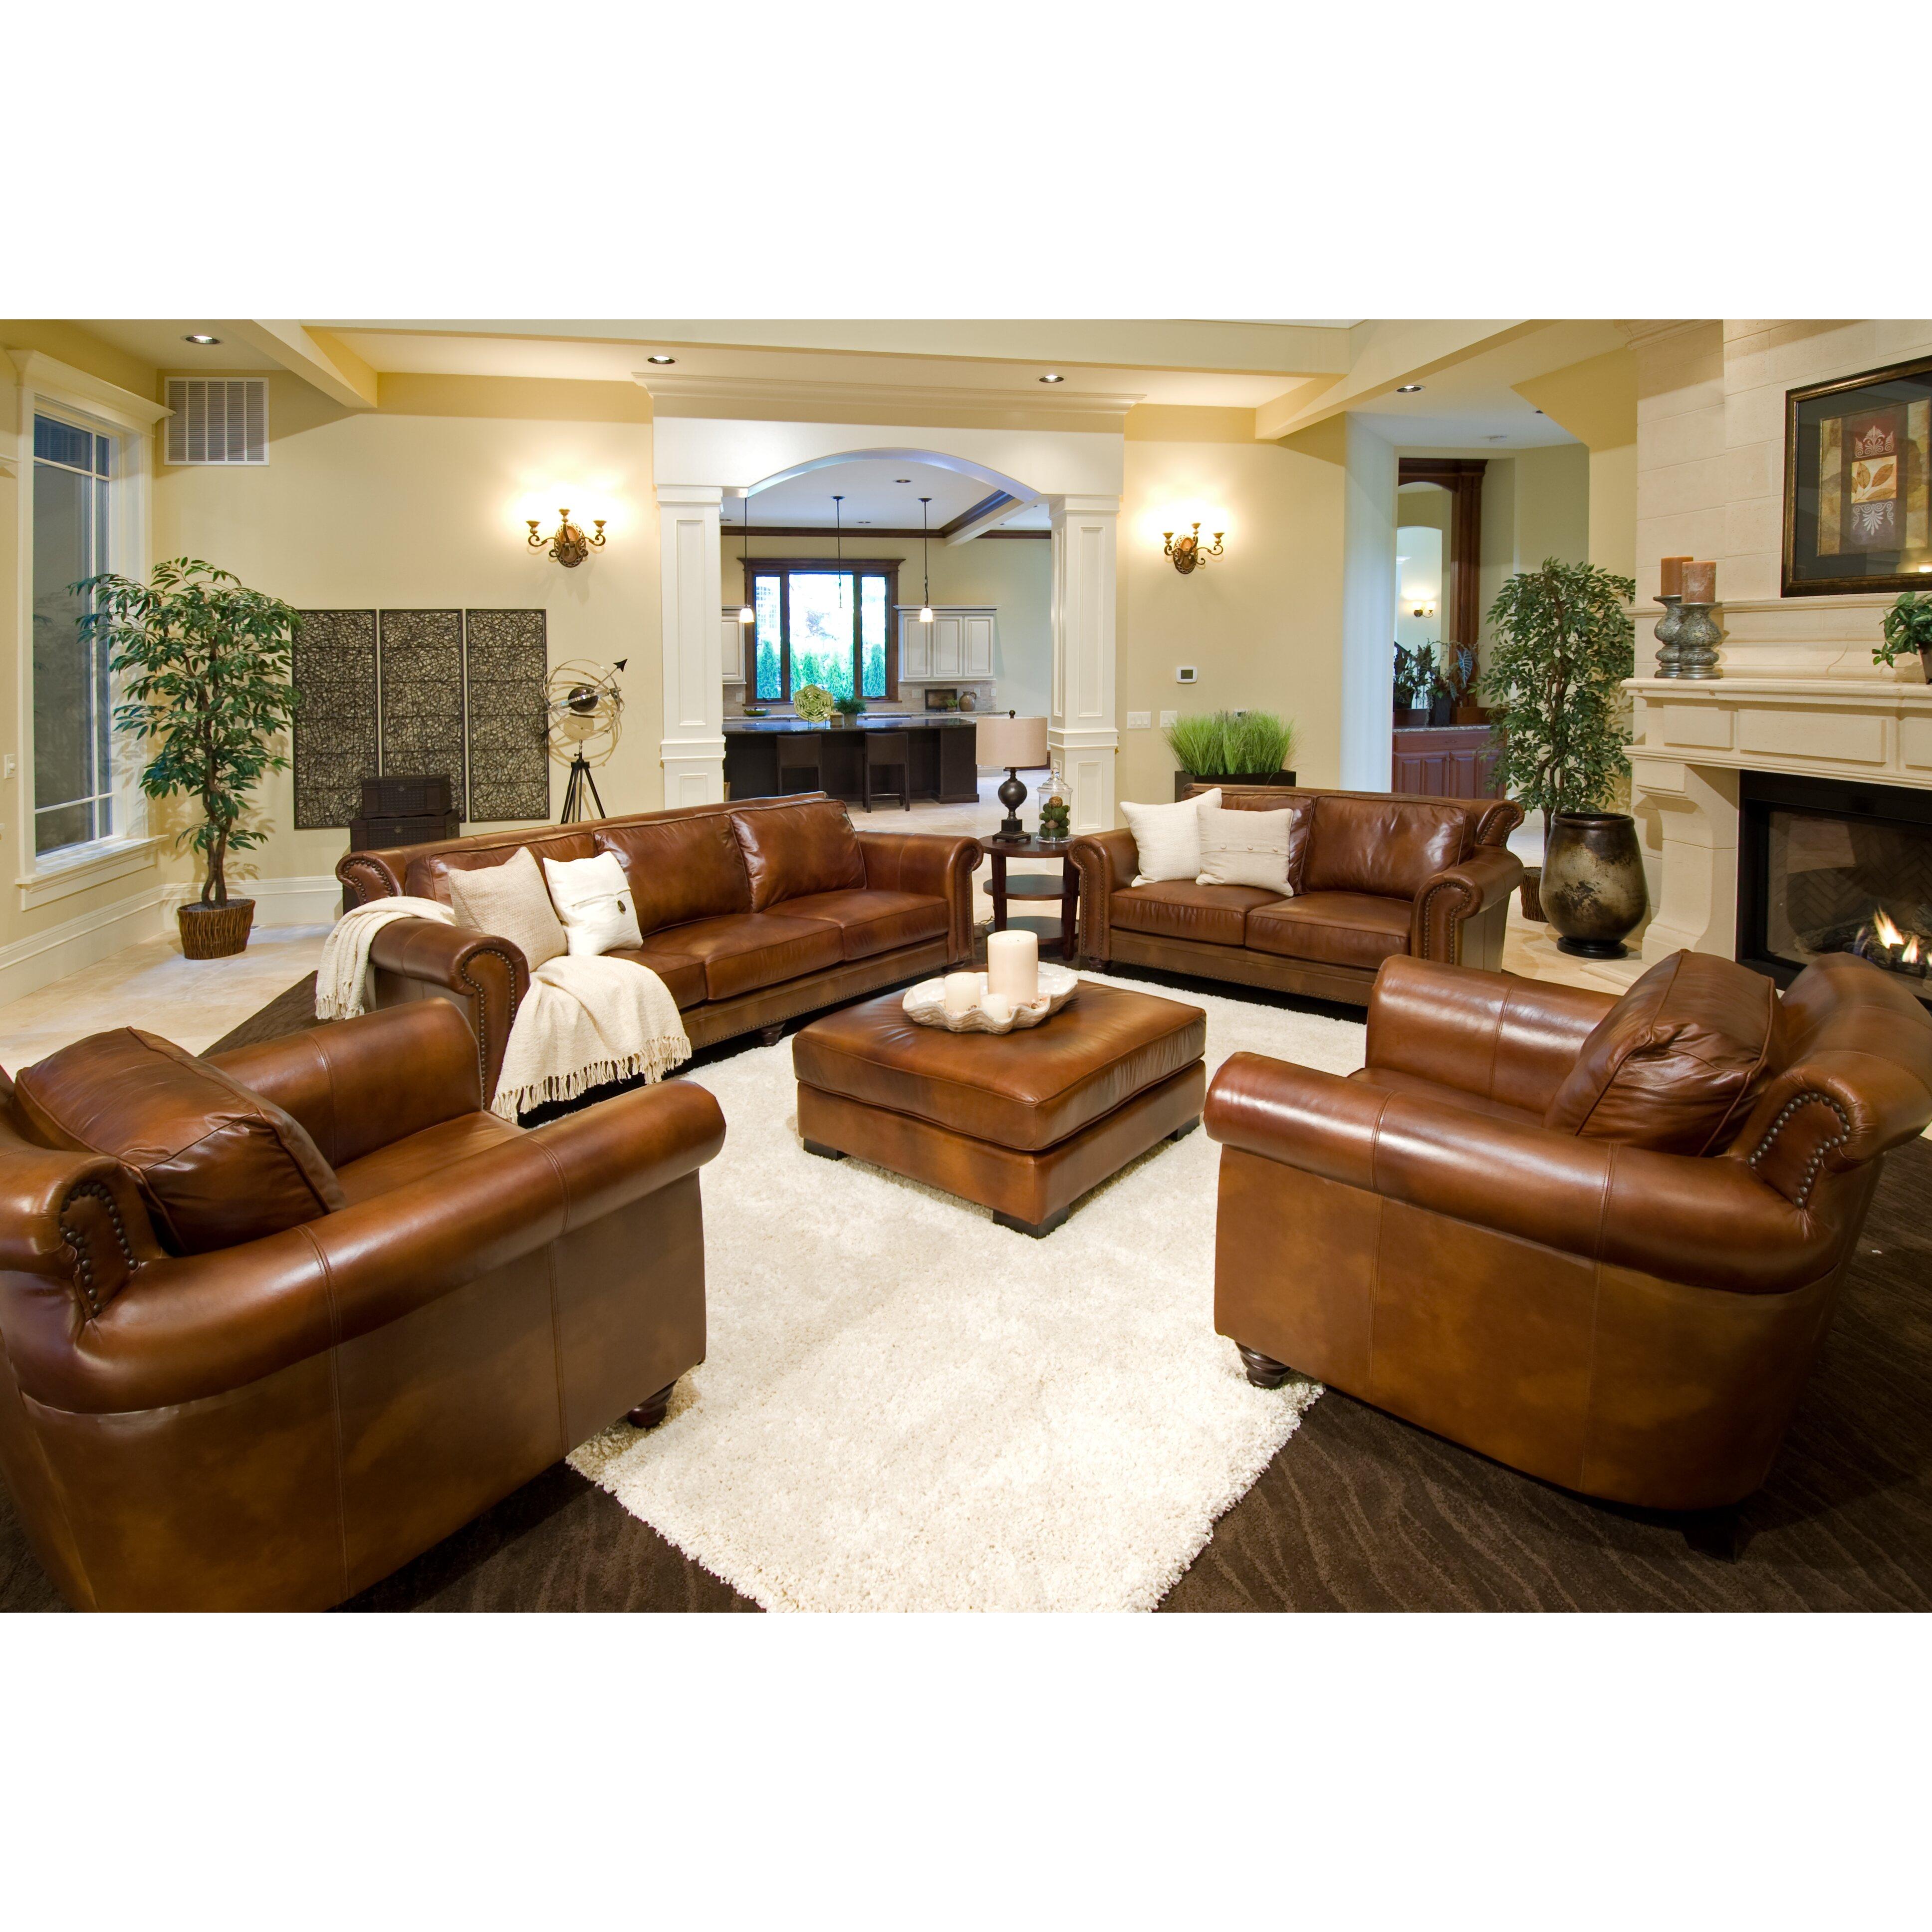 Home Element Furniture: Elements Fine Home Furnishings Paladia Living Room